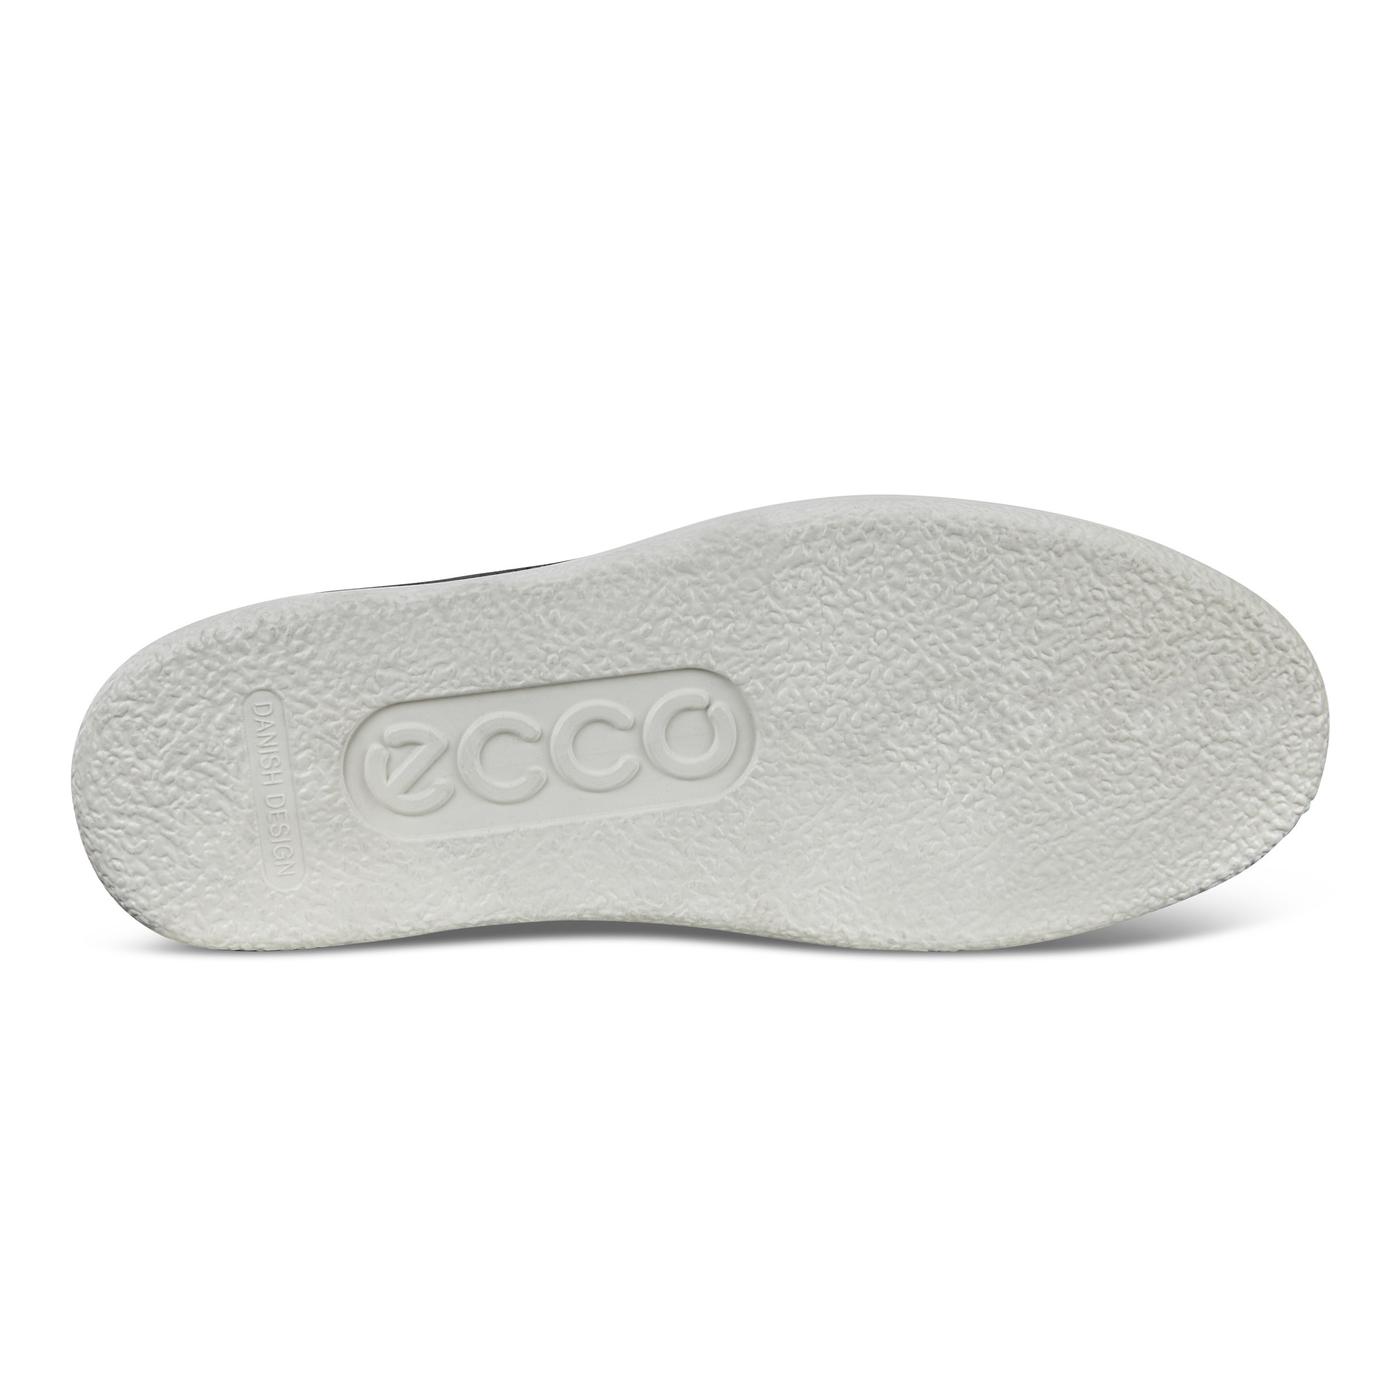 ECCO SOFT 1 Men's Slip On